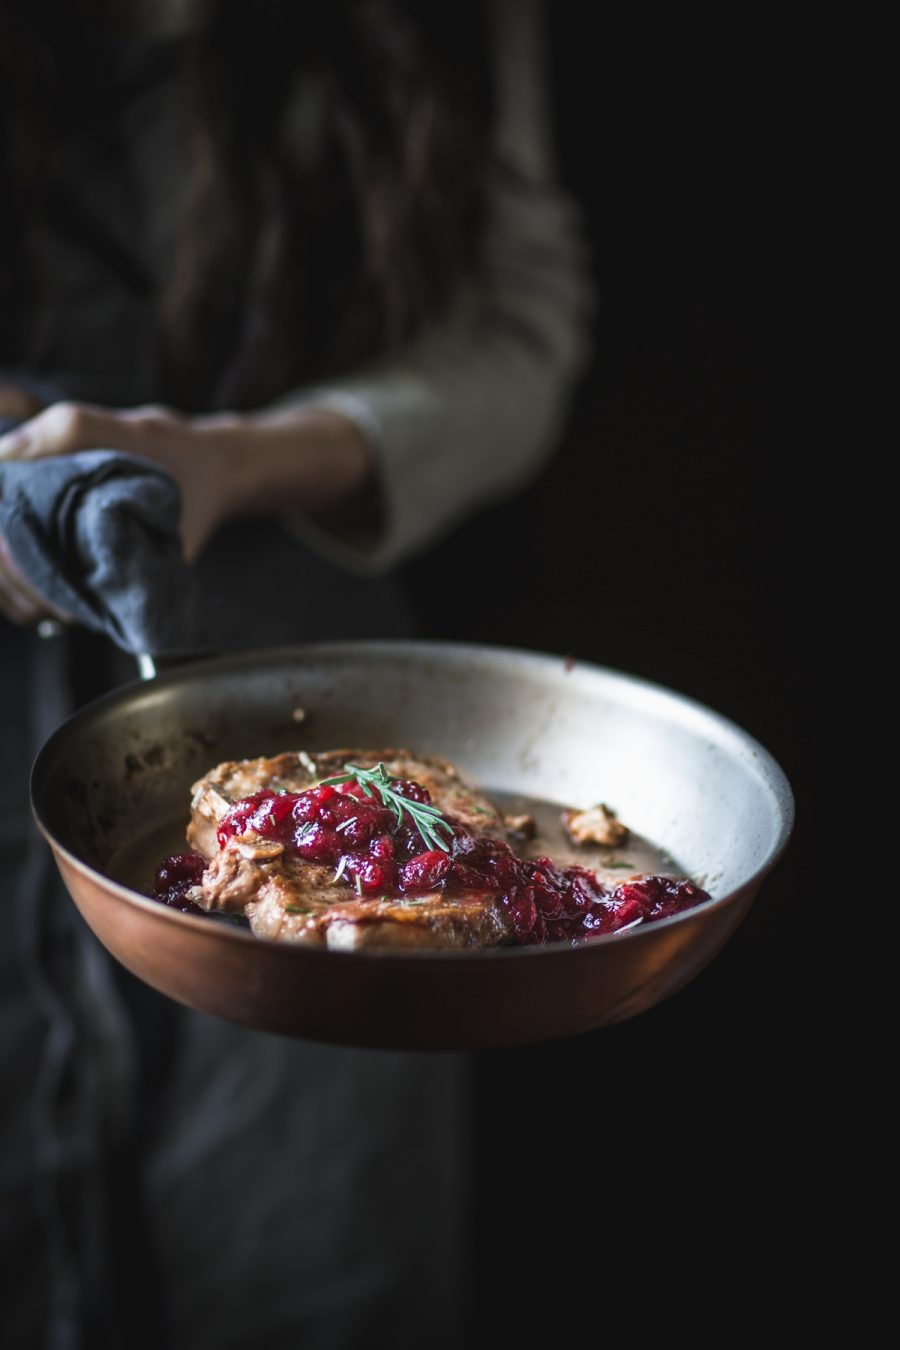 Pork Chops with Cranberry Balsamic Glaze